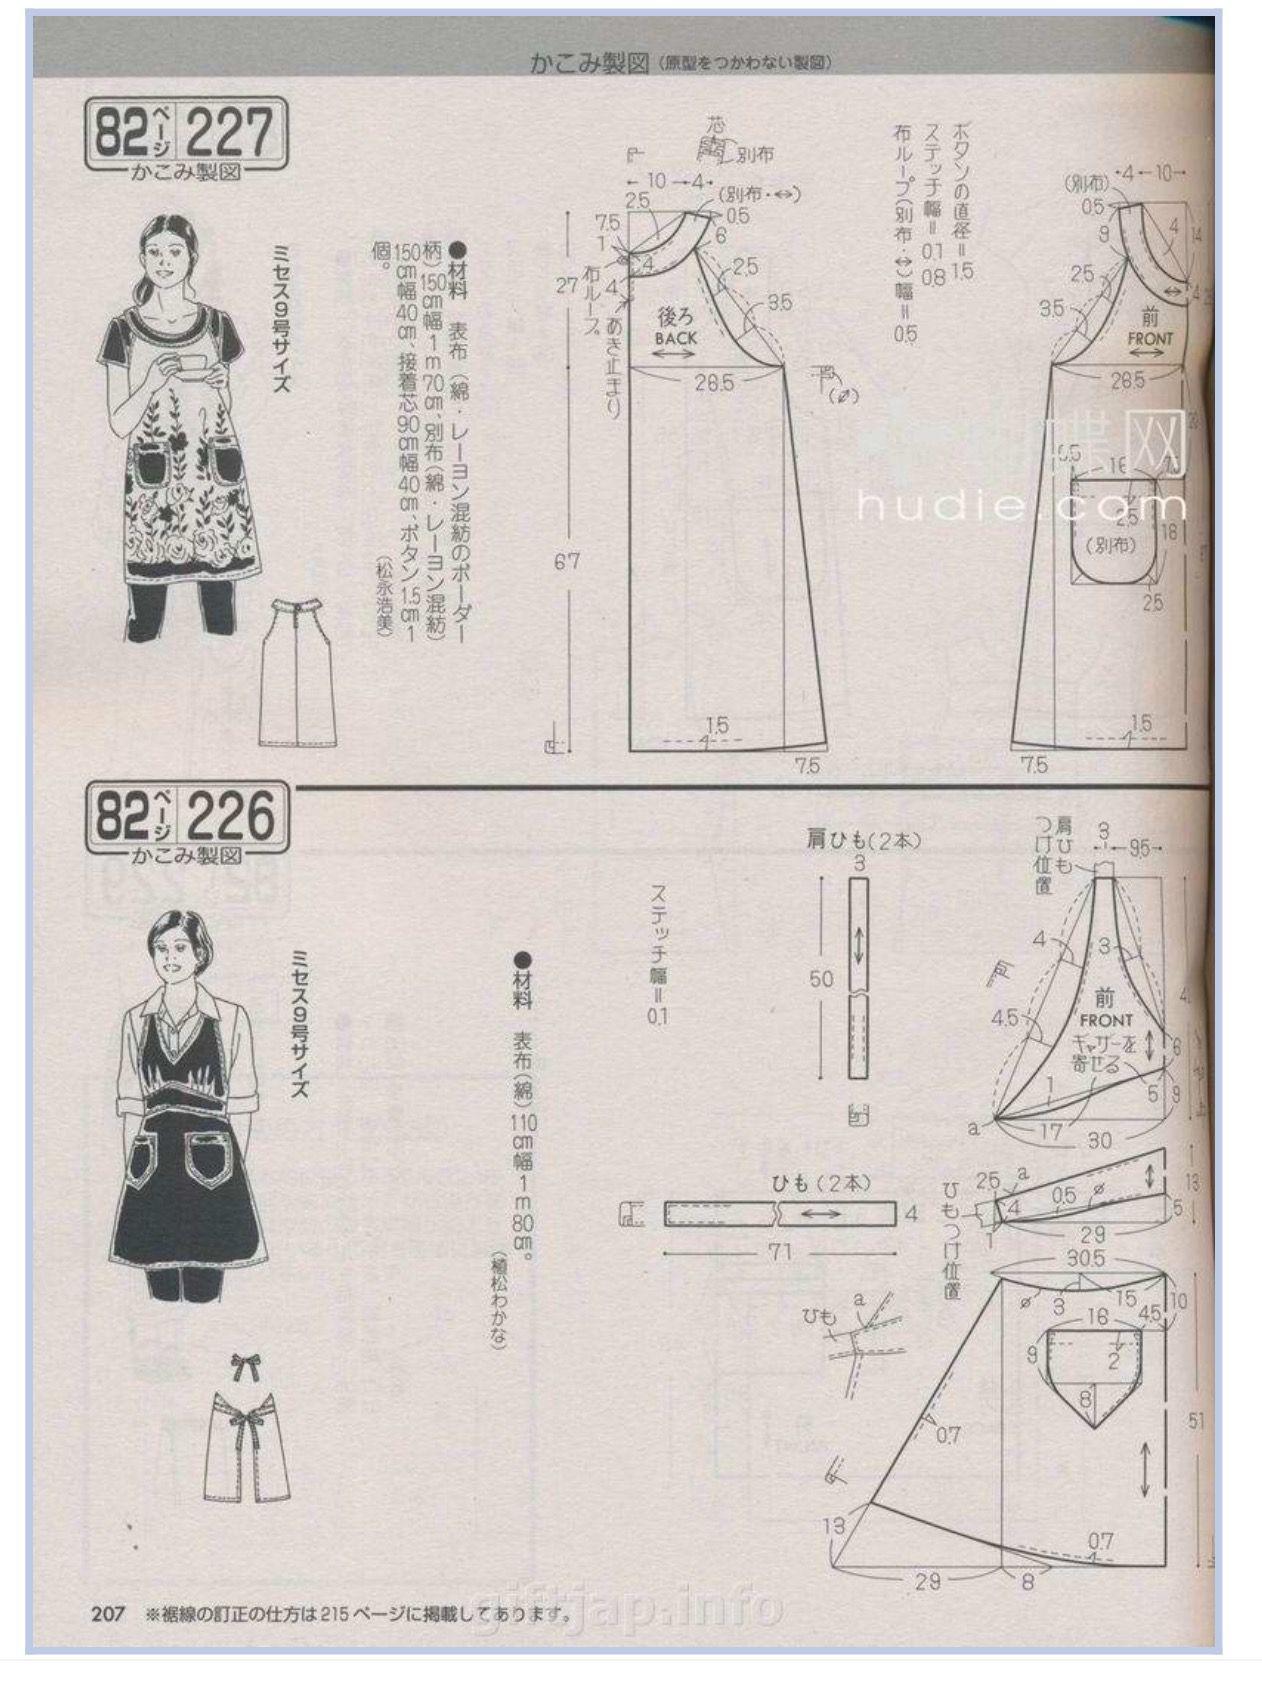 Pin von Chung Chiang Tai auf 孕婦服 | Pinterest